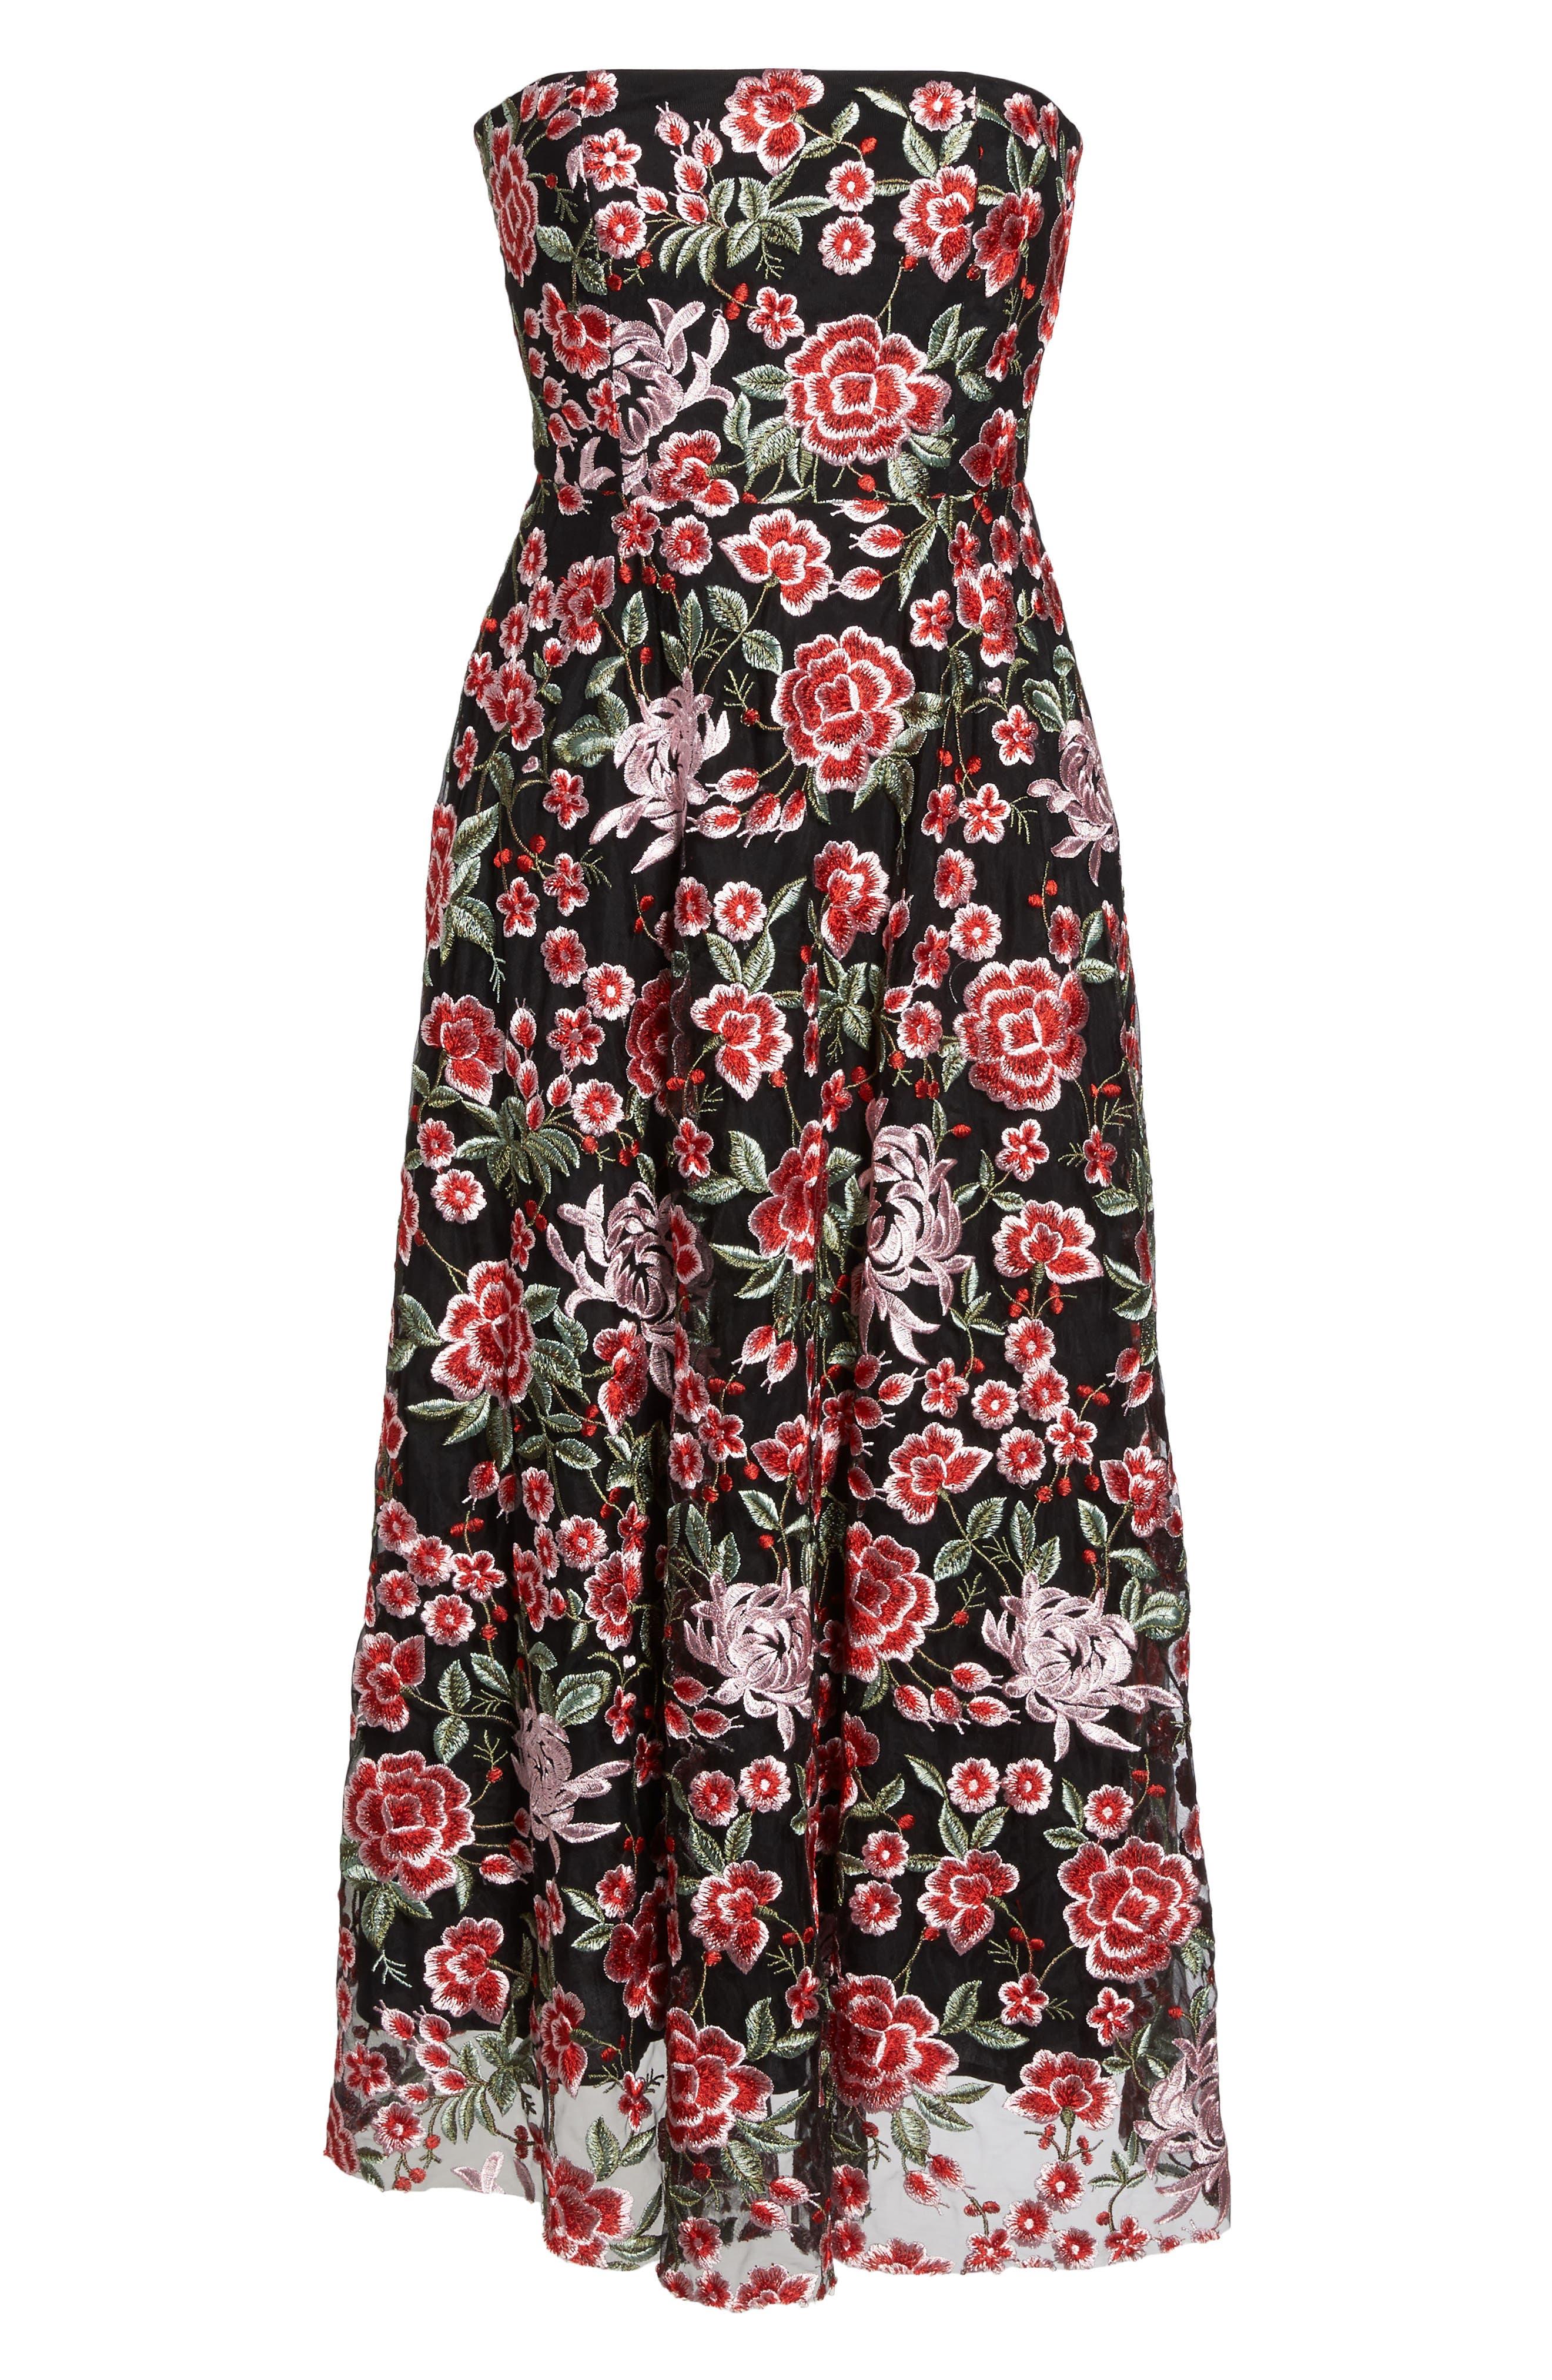 Cosette Embroidered Strapless Dress,                             Alternate thumbnail 6, color,                             Black Multi